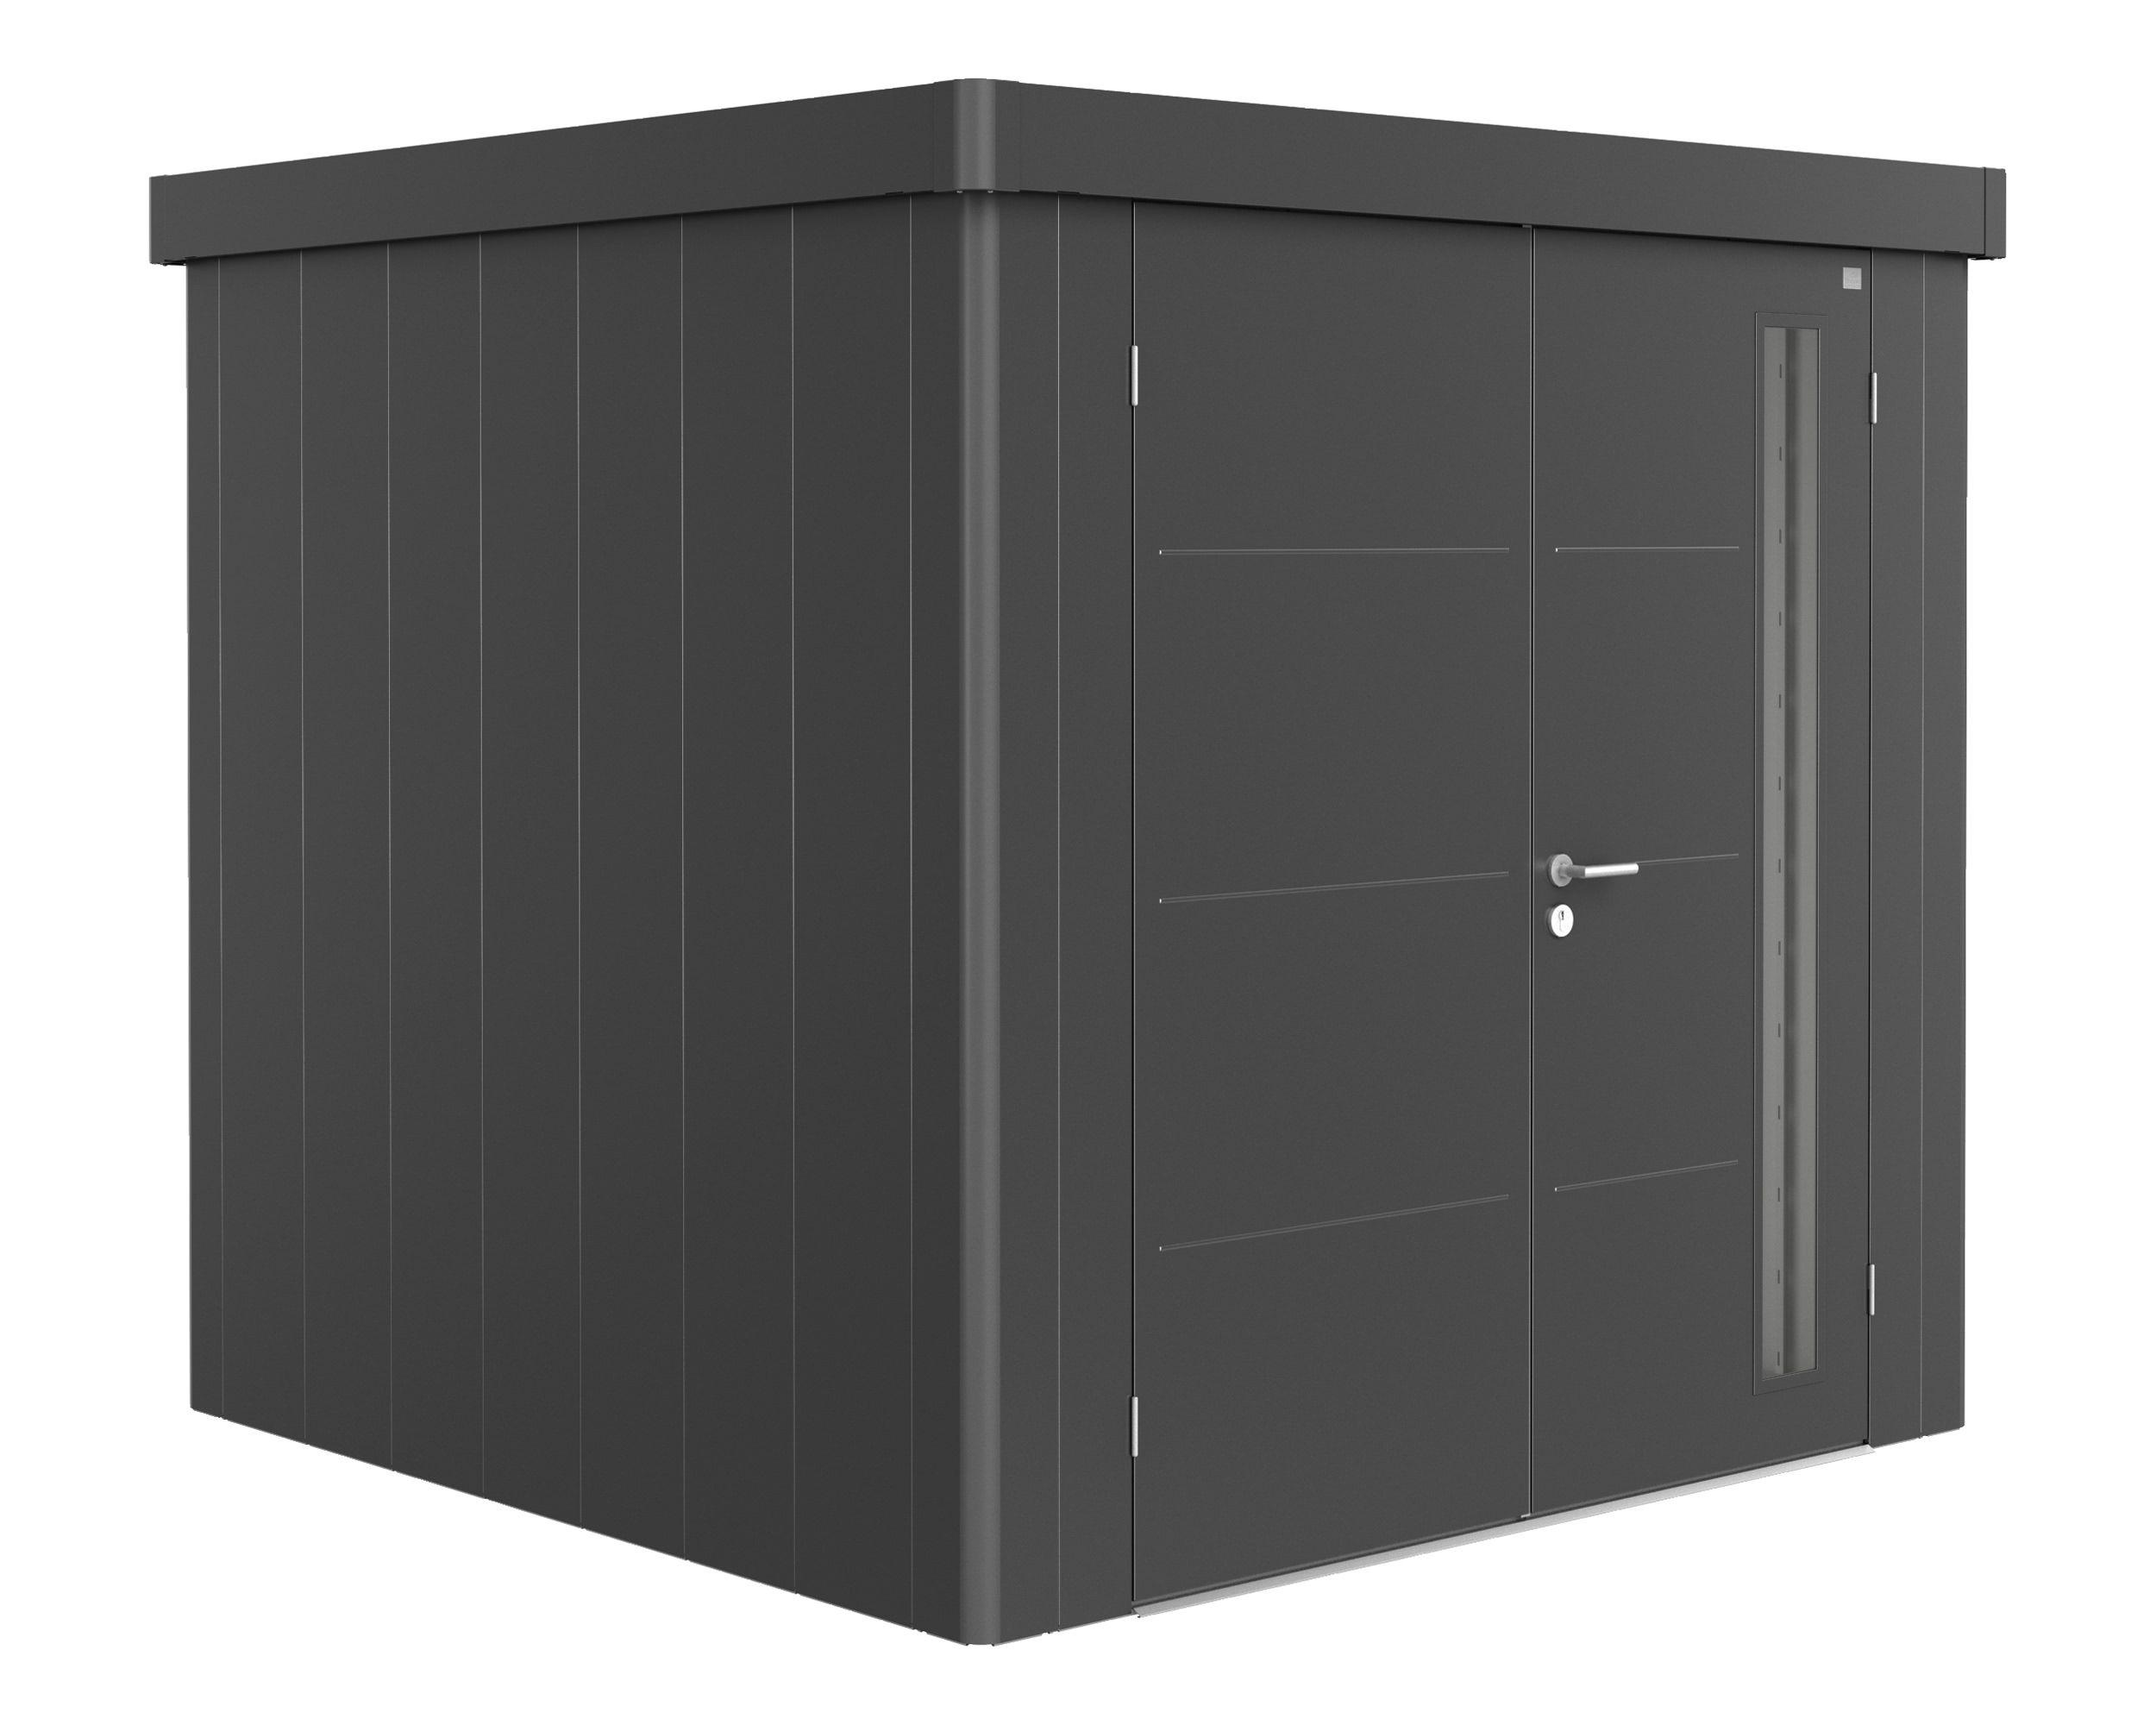 Gerätehaus Neo, 2B, 236x236 cm, Doppeltüre